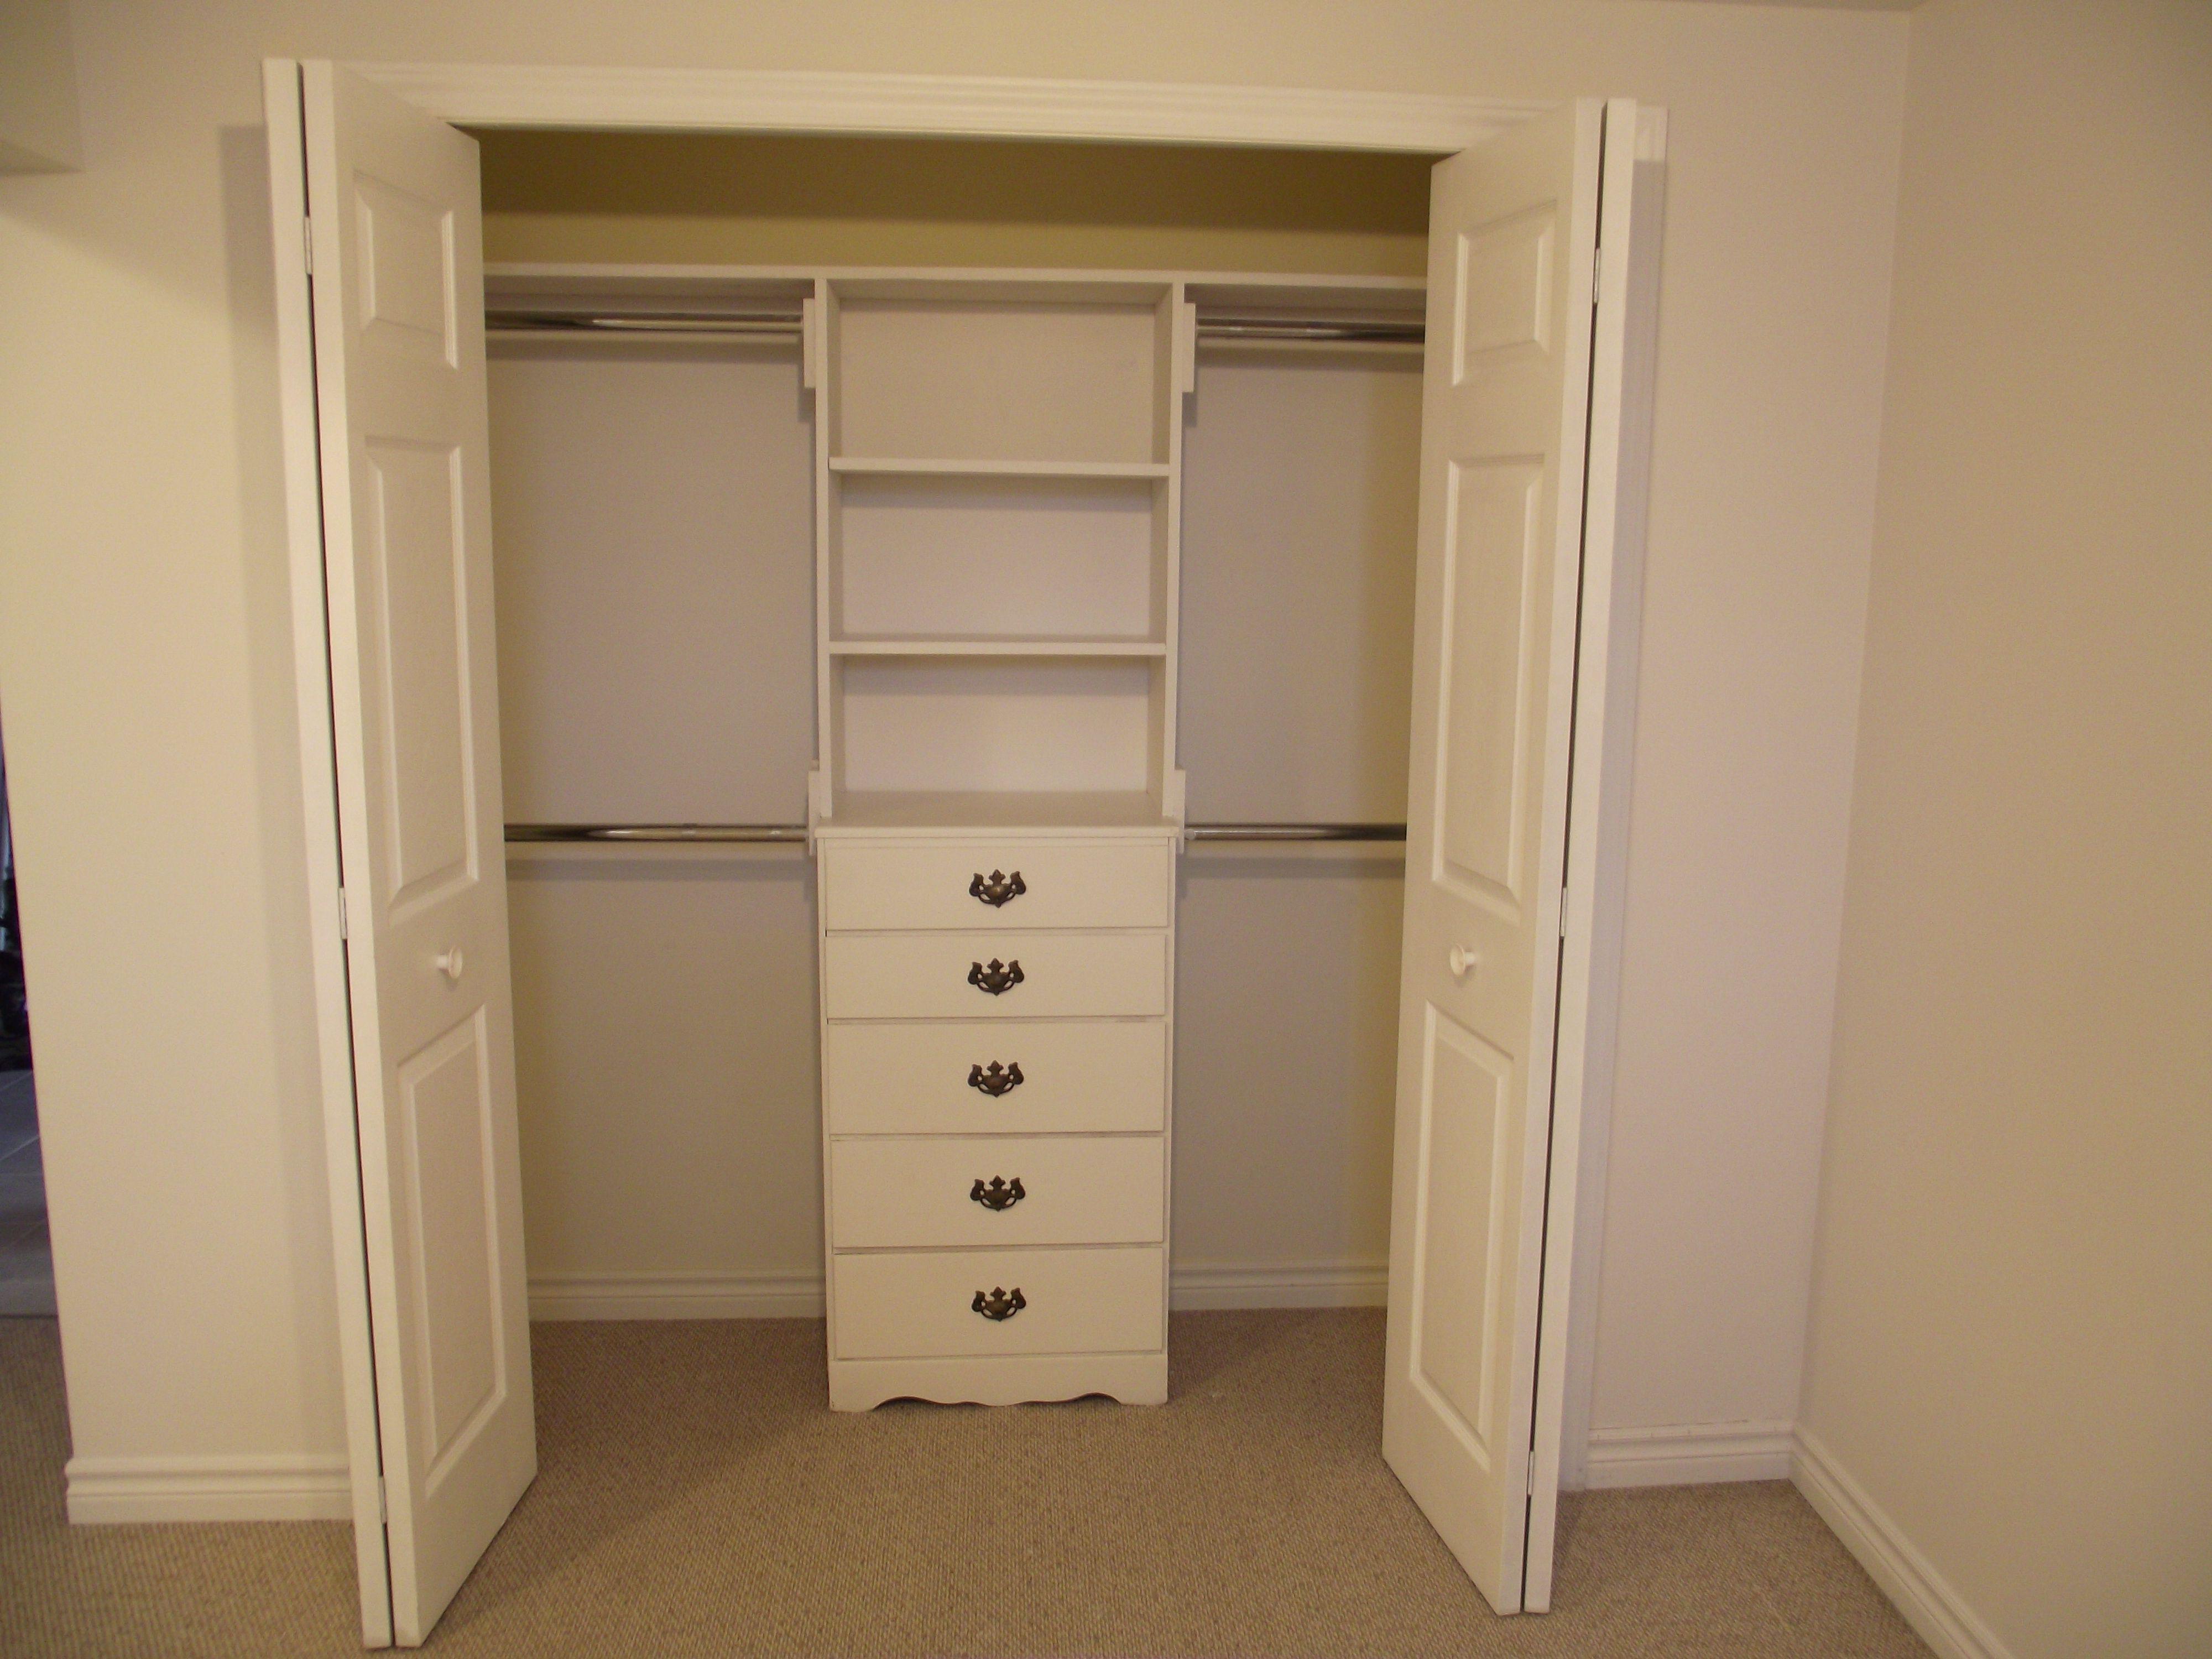 Custom Closet On A Budget Built In This $20 Bureau